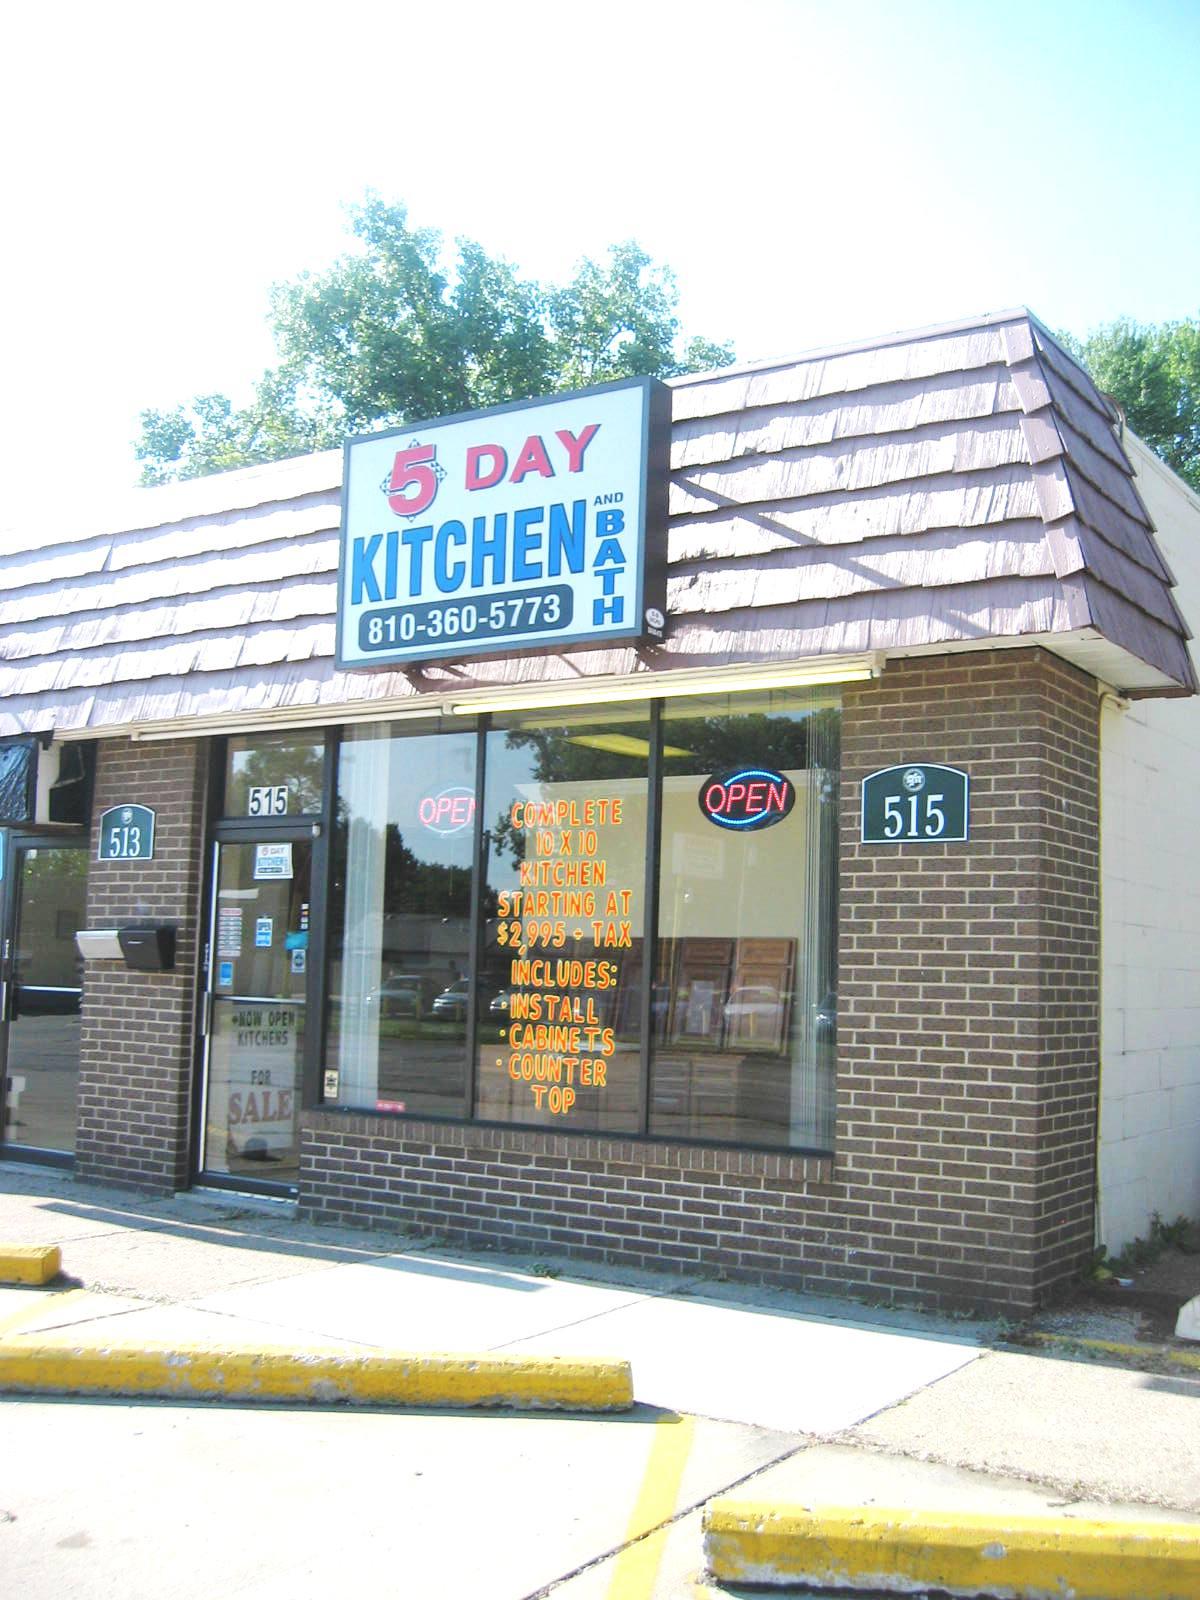 5 Day Kitchen and Bath Cabinets - Madison Heights, MI